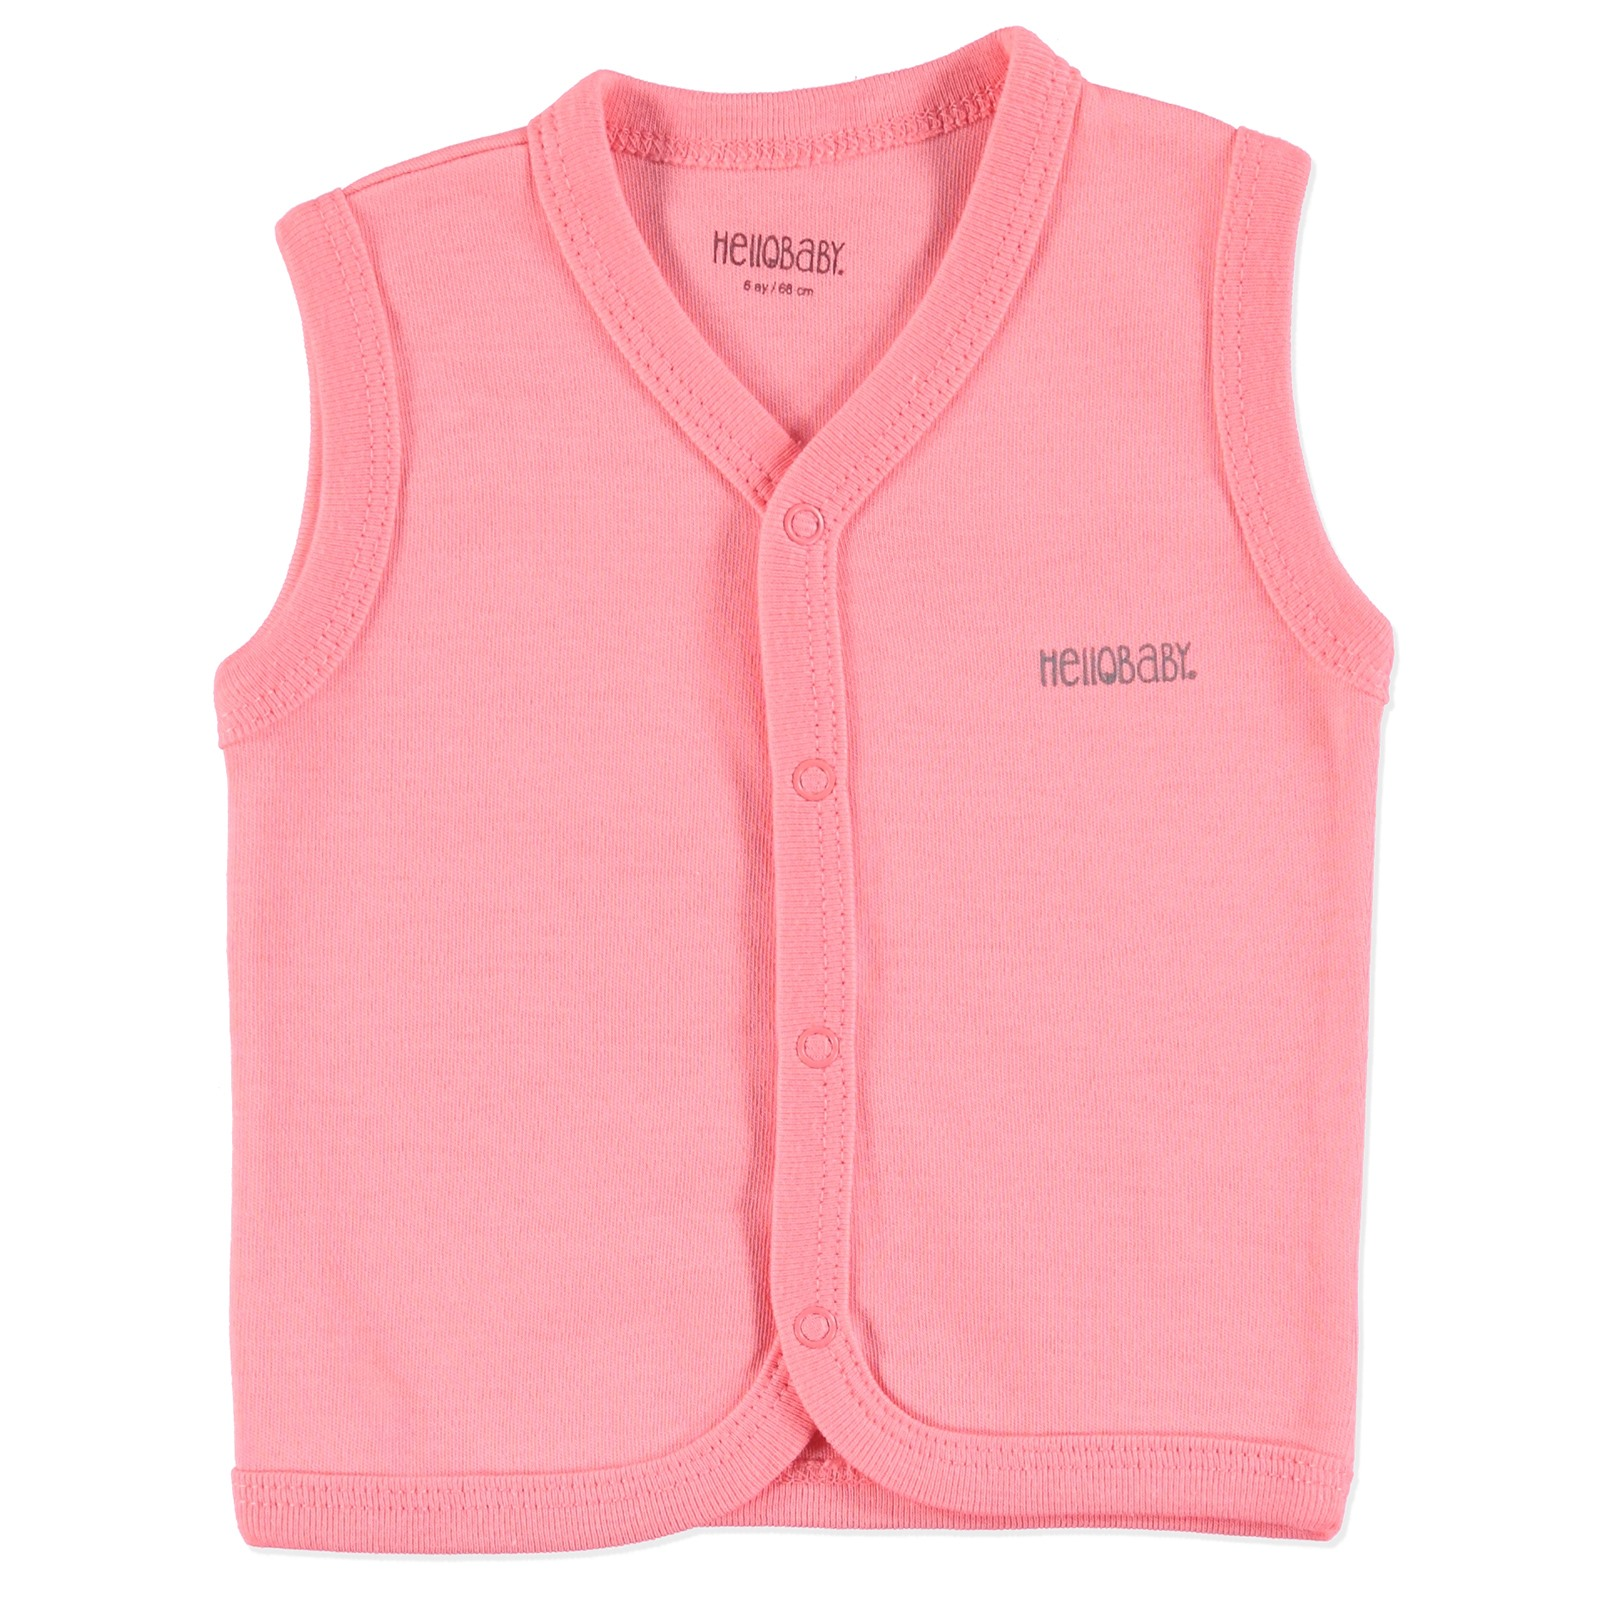 Ebebek HelloBaby Basic Sleeveless Baby Vest